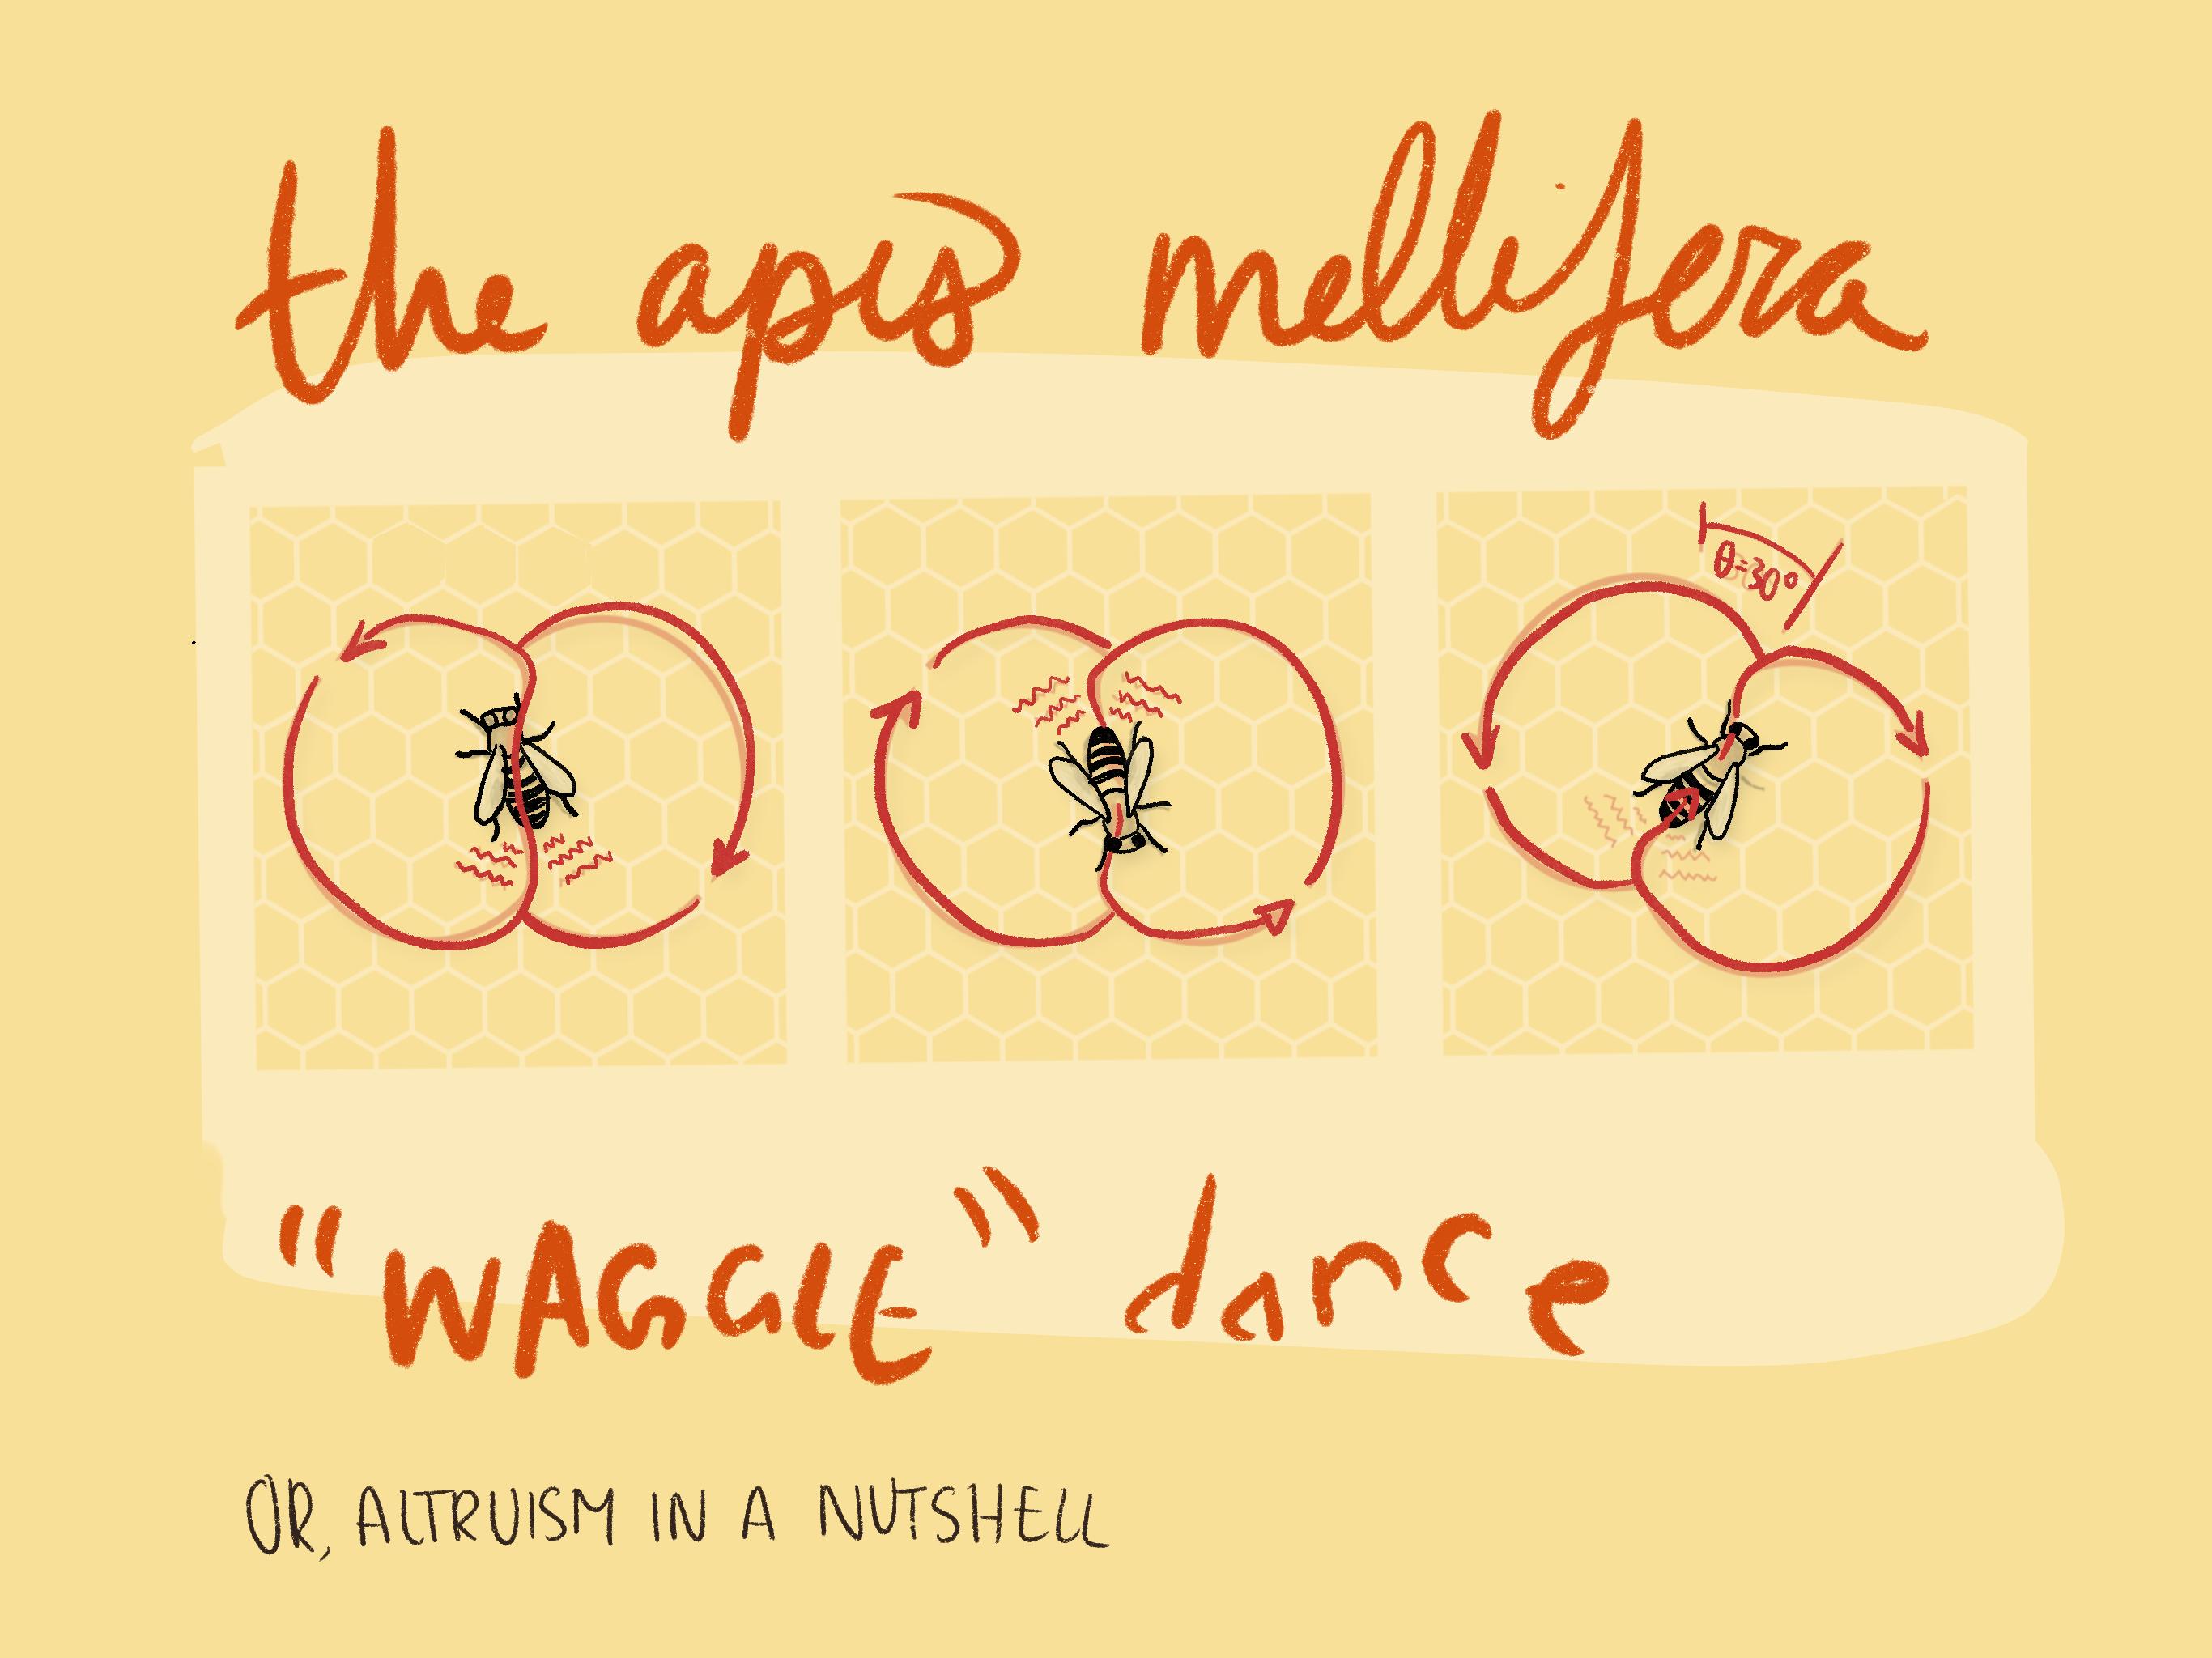 https://cloud-7kb8q7efb.vercel.app/0apis-melliflora-waggle-dance.png